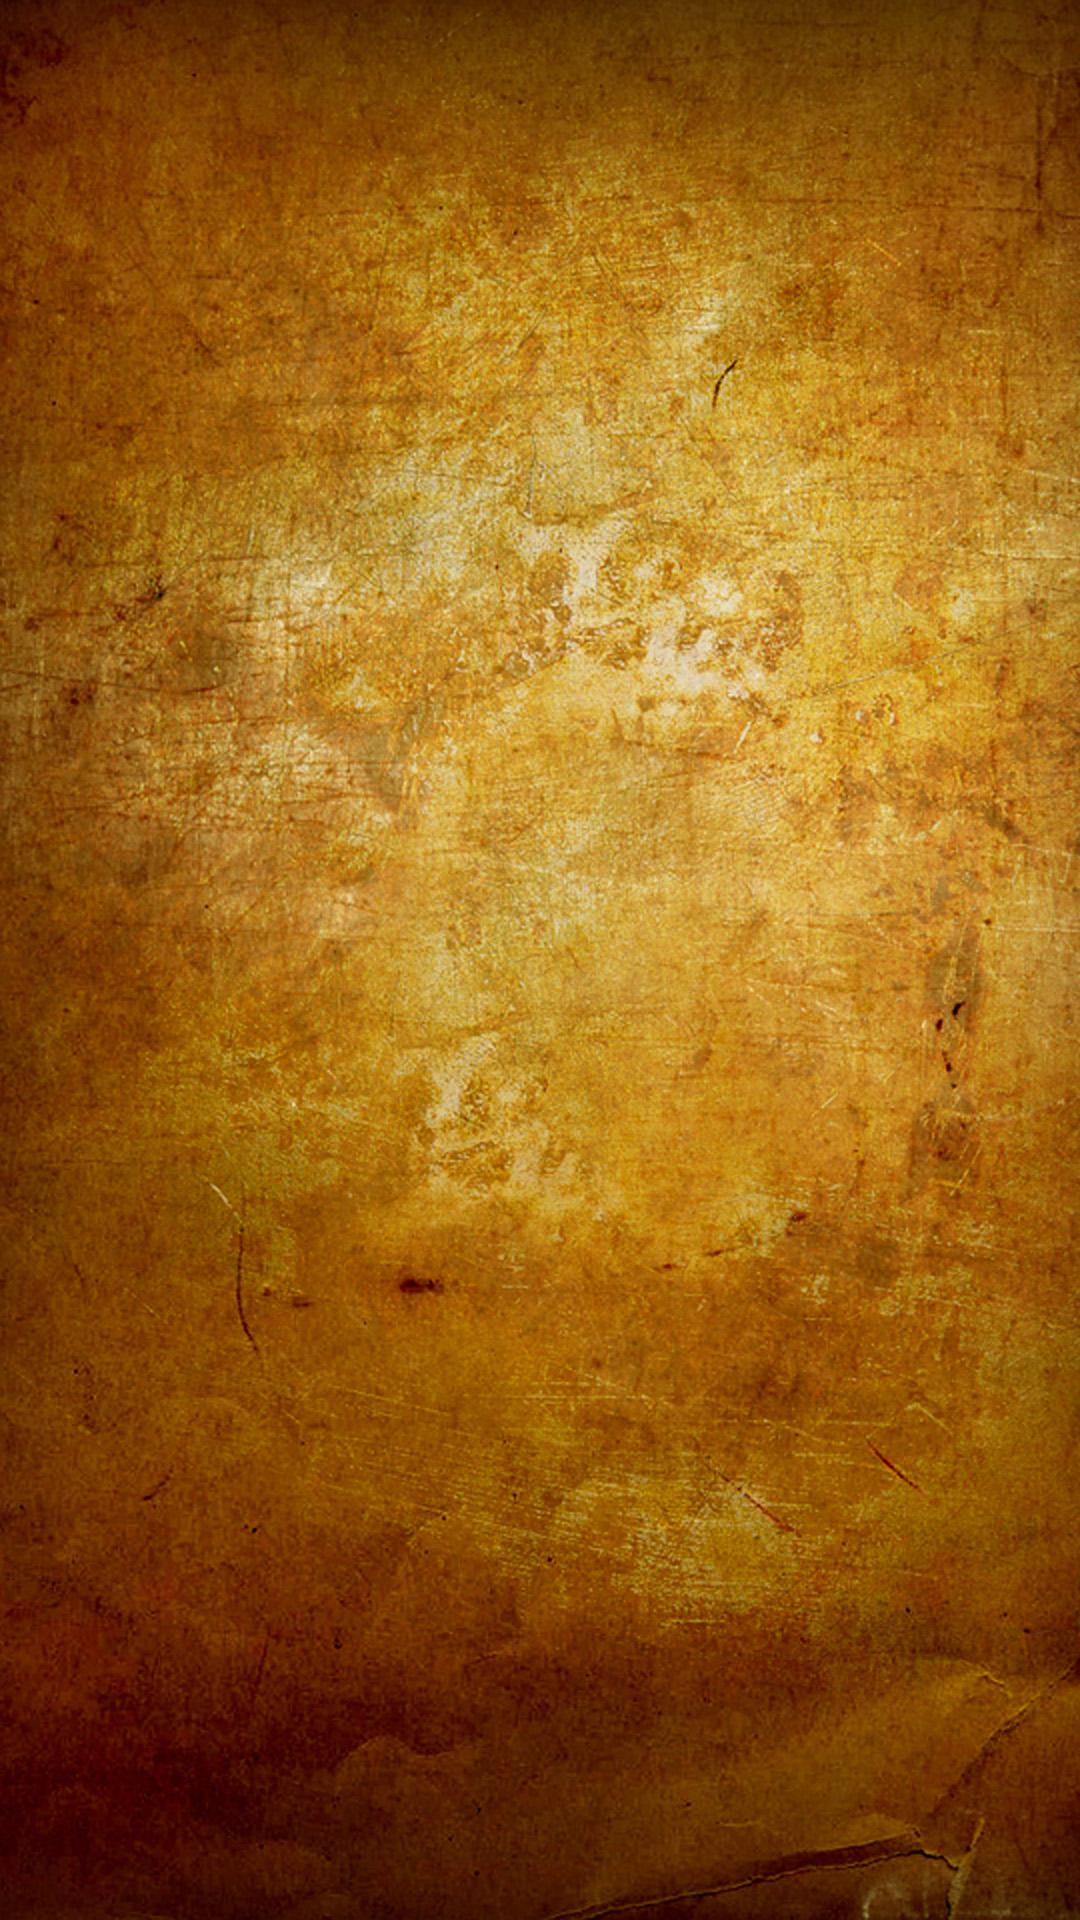 38 Gold Galaxy S6 Wallpaper On Wallpapersafari